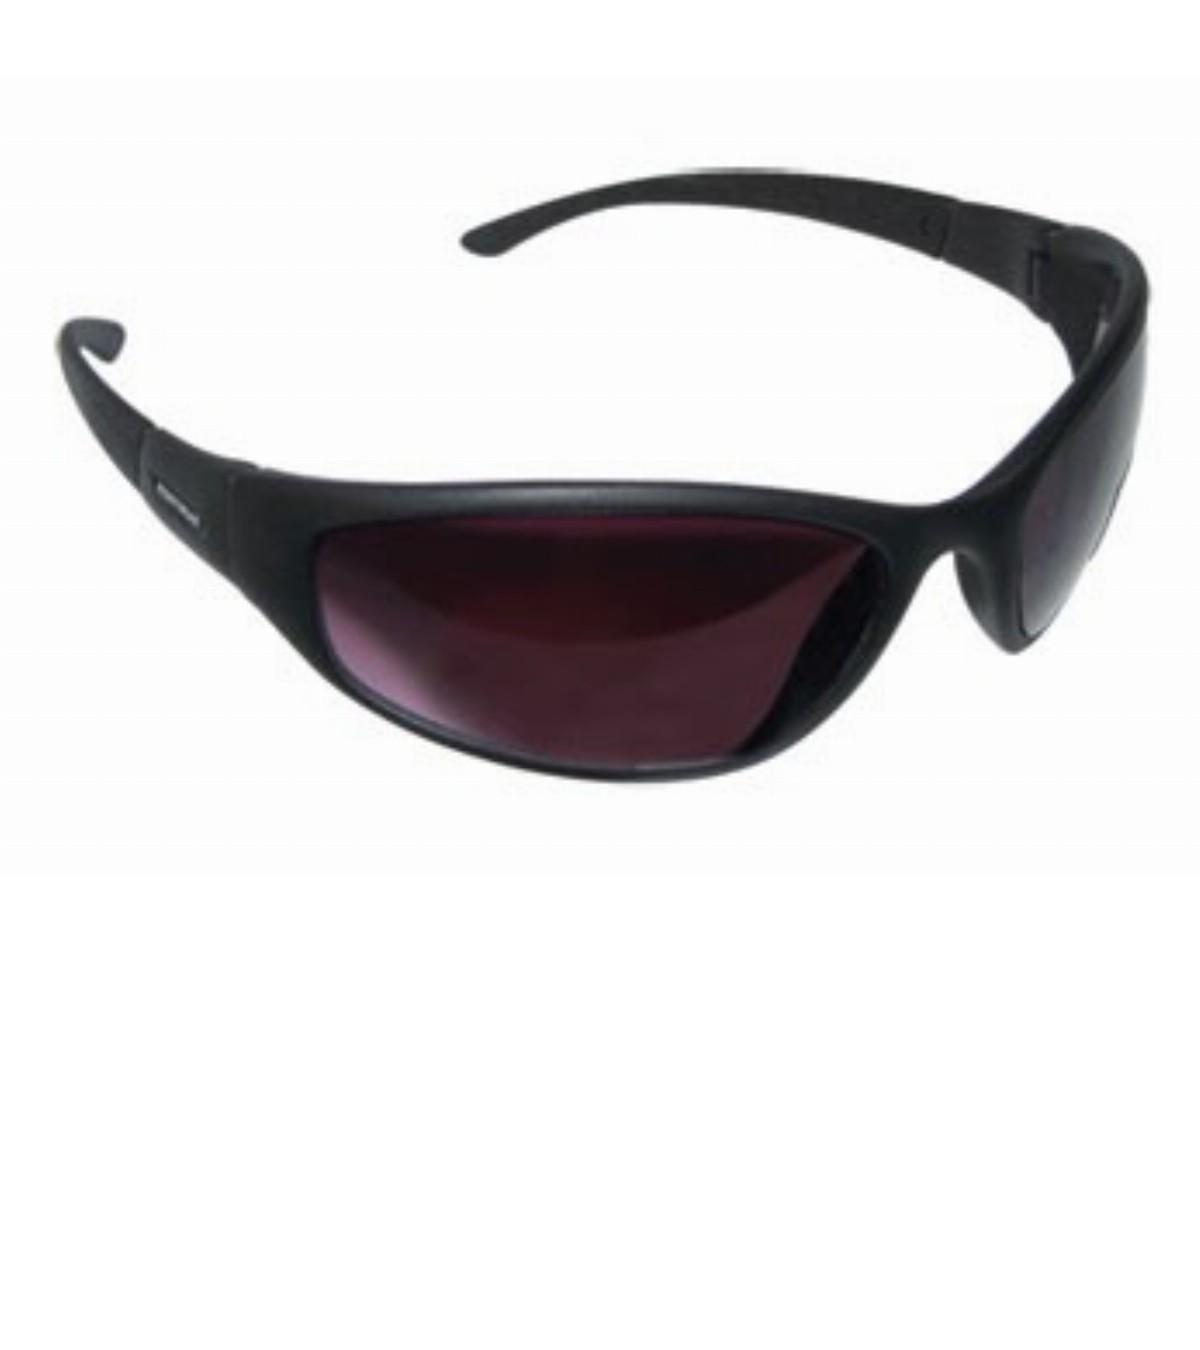 c7708407d0 Montagne: gafas deportes, anteojos para nieve, gafas trekking, gafas ...